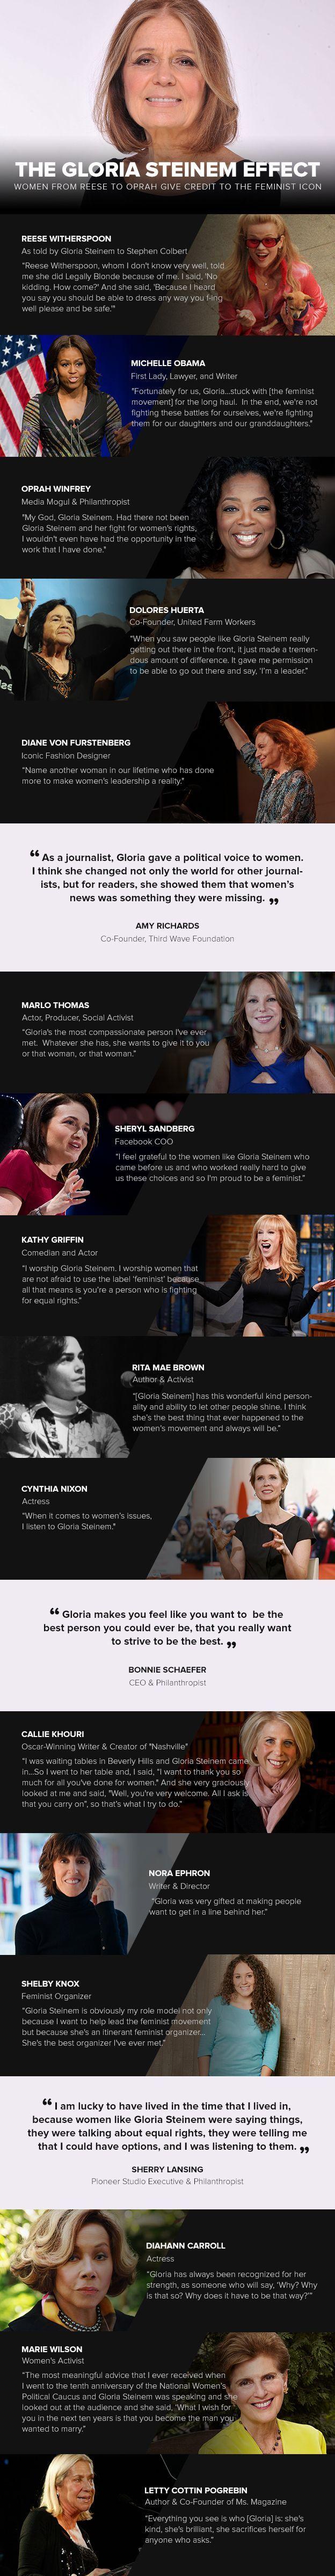 In honor of Gloria Steinem's birthday! Celebrating feminism and the history of women. #HBDGloria [Infographic]